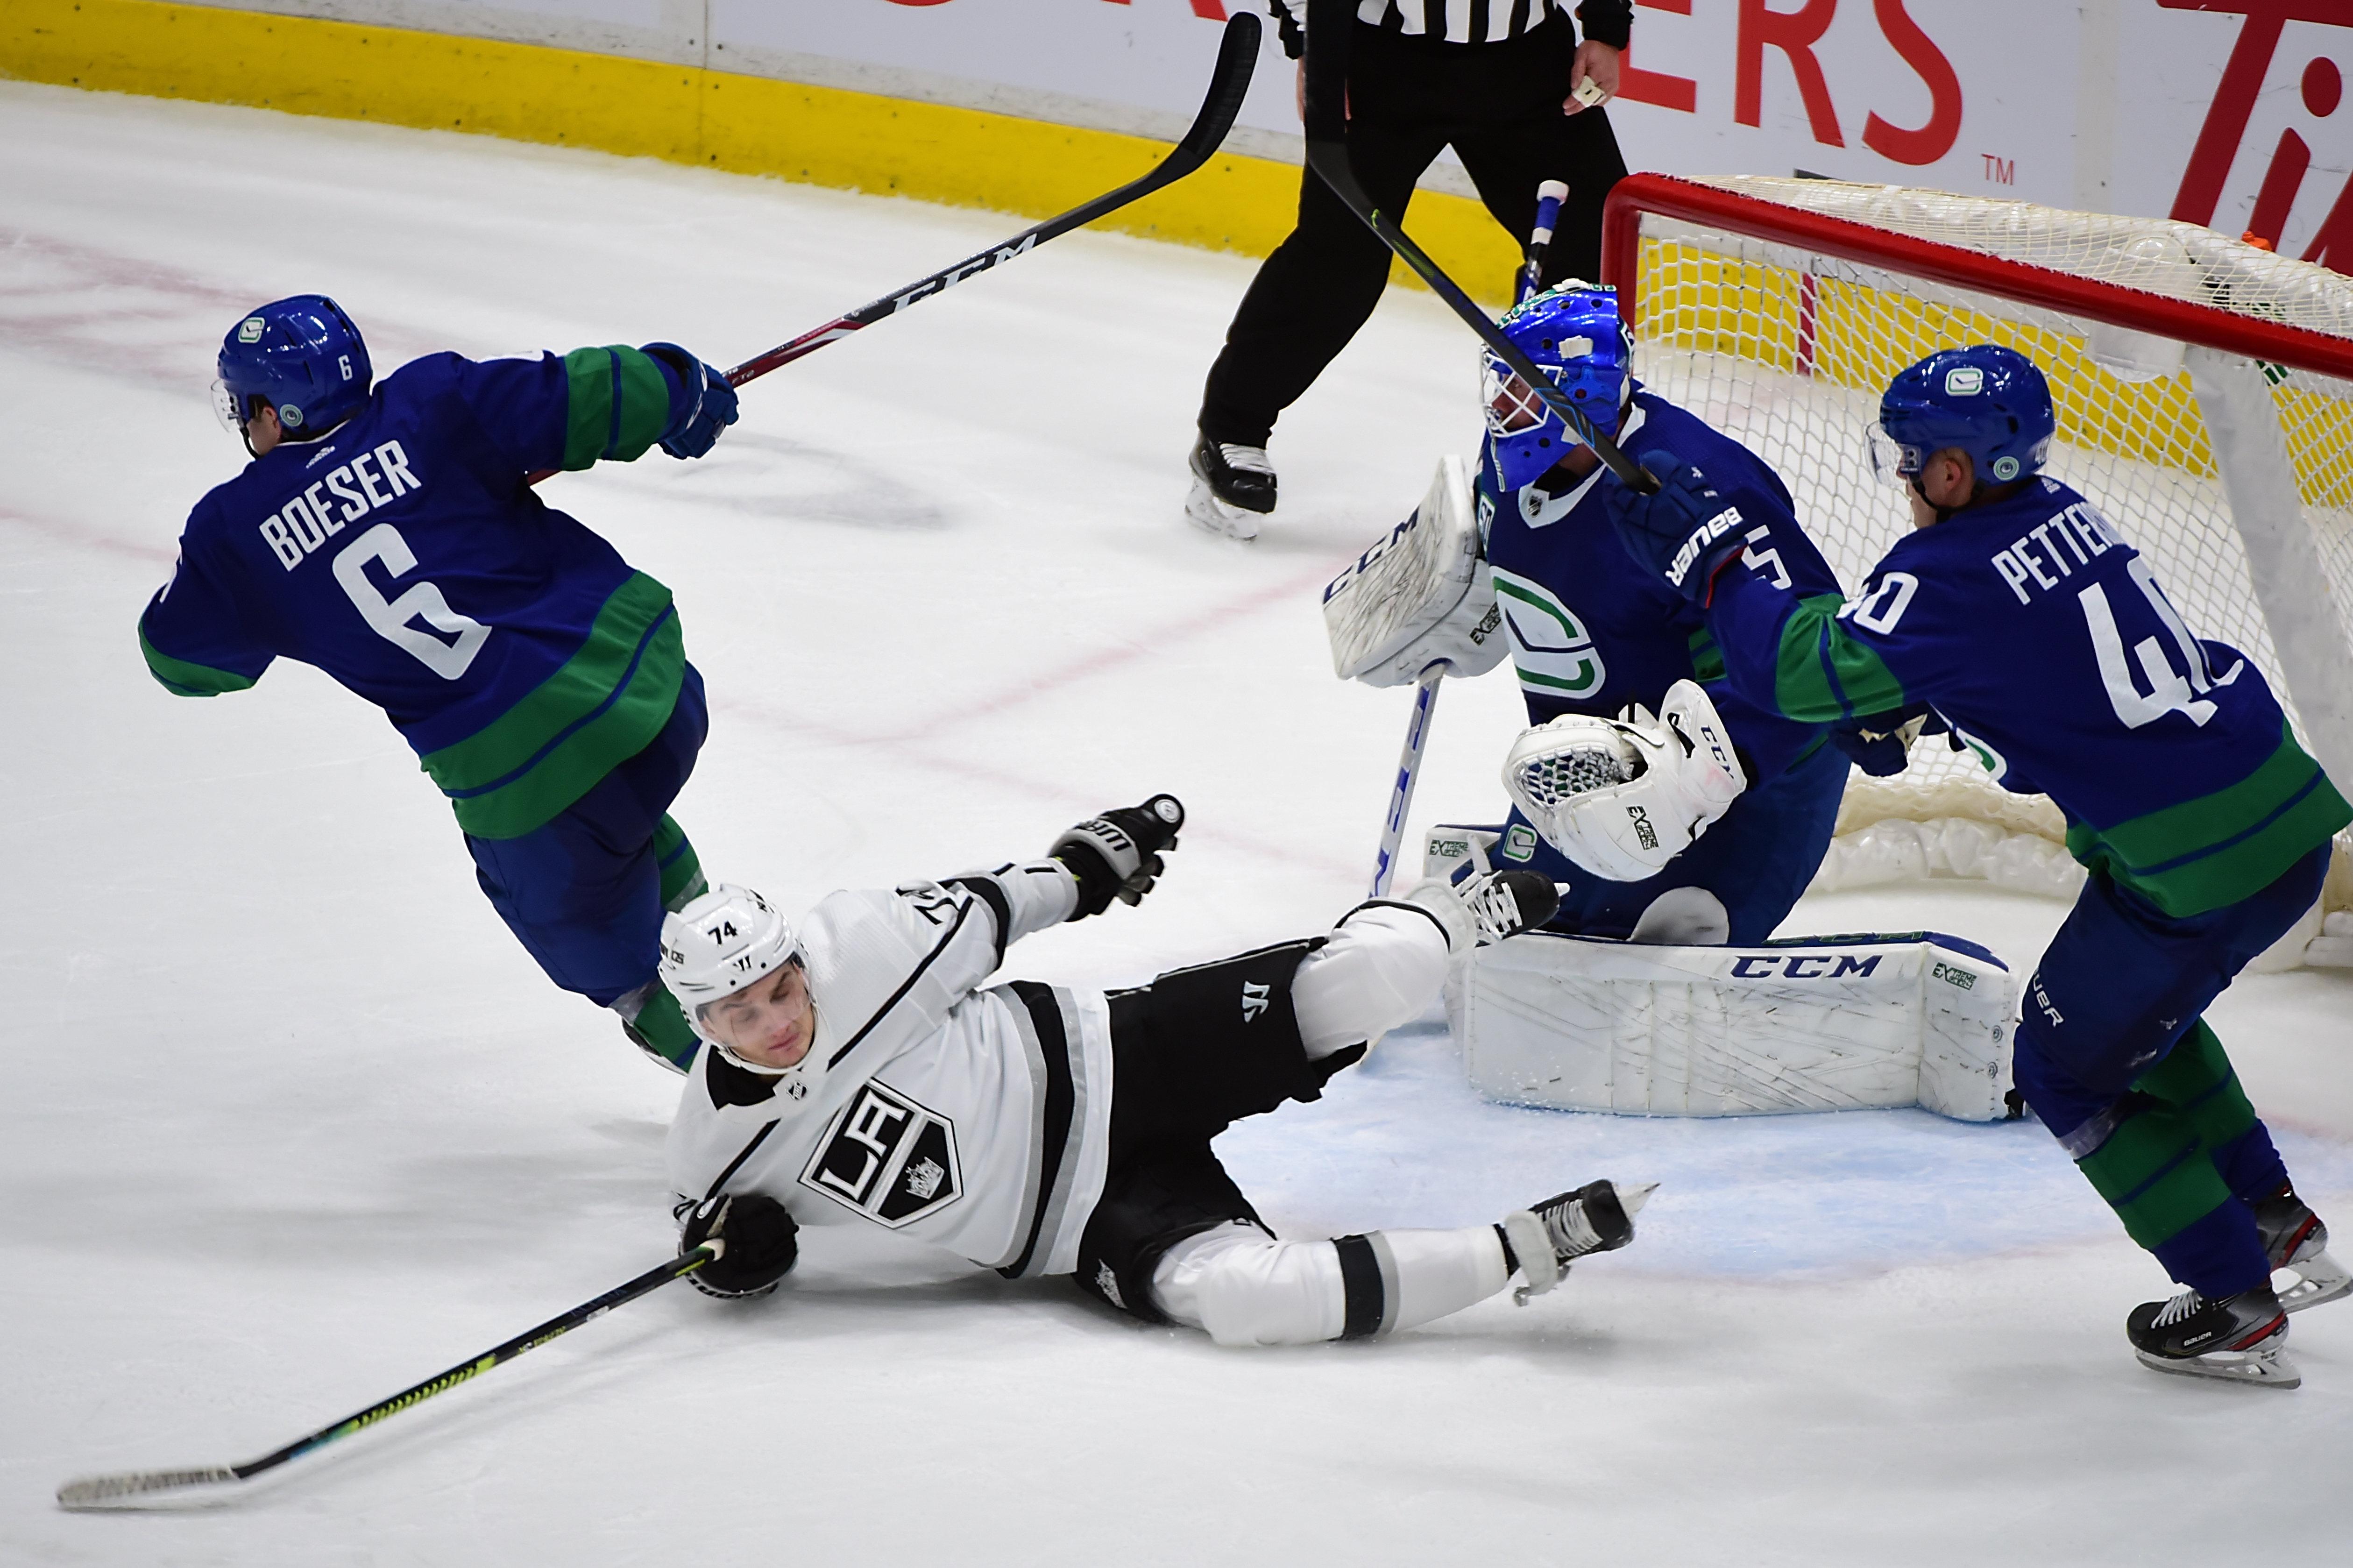 NHL: Los Angeles Kings at Vancouver Canucks